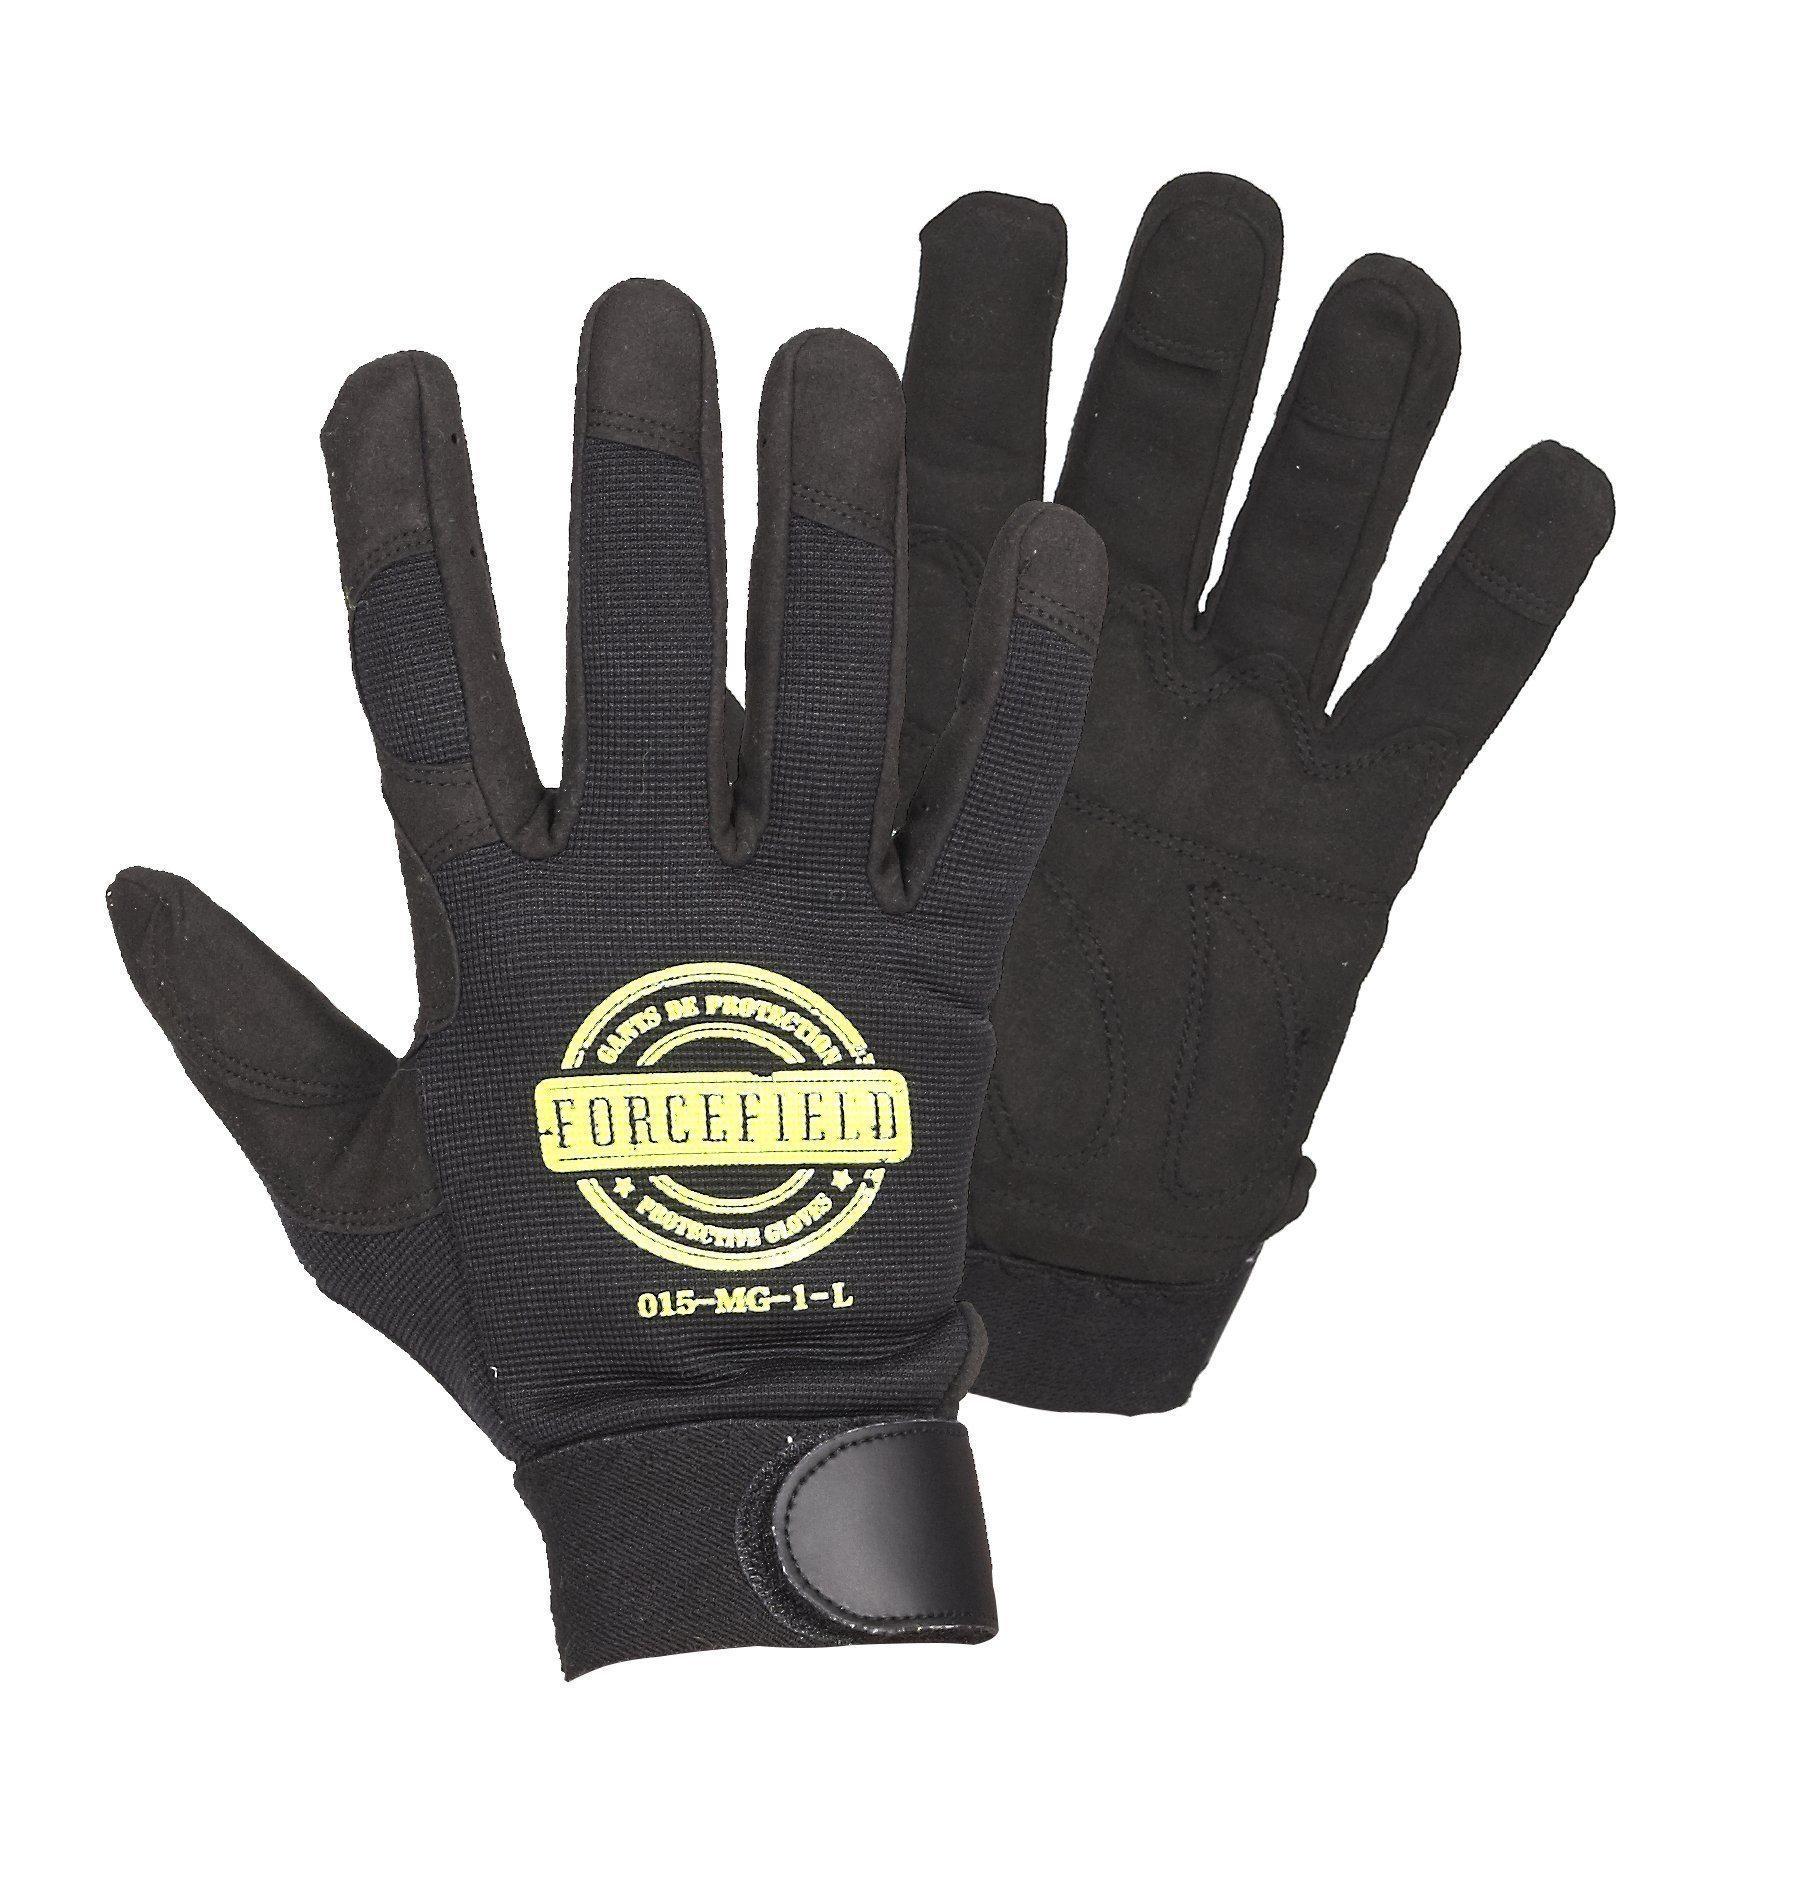 Mechanics Glove -Forcefield-Unlined-Black (Large), 015-MG1-L